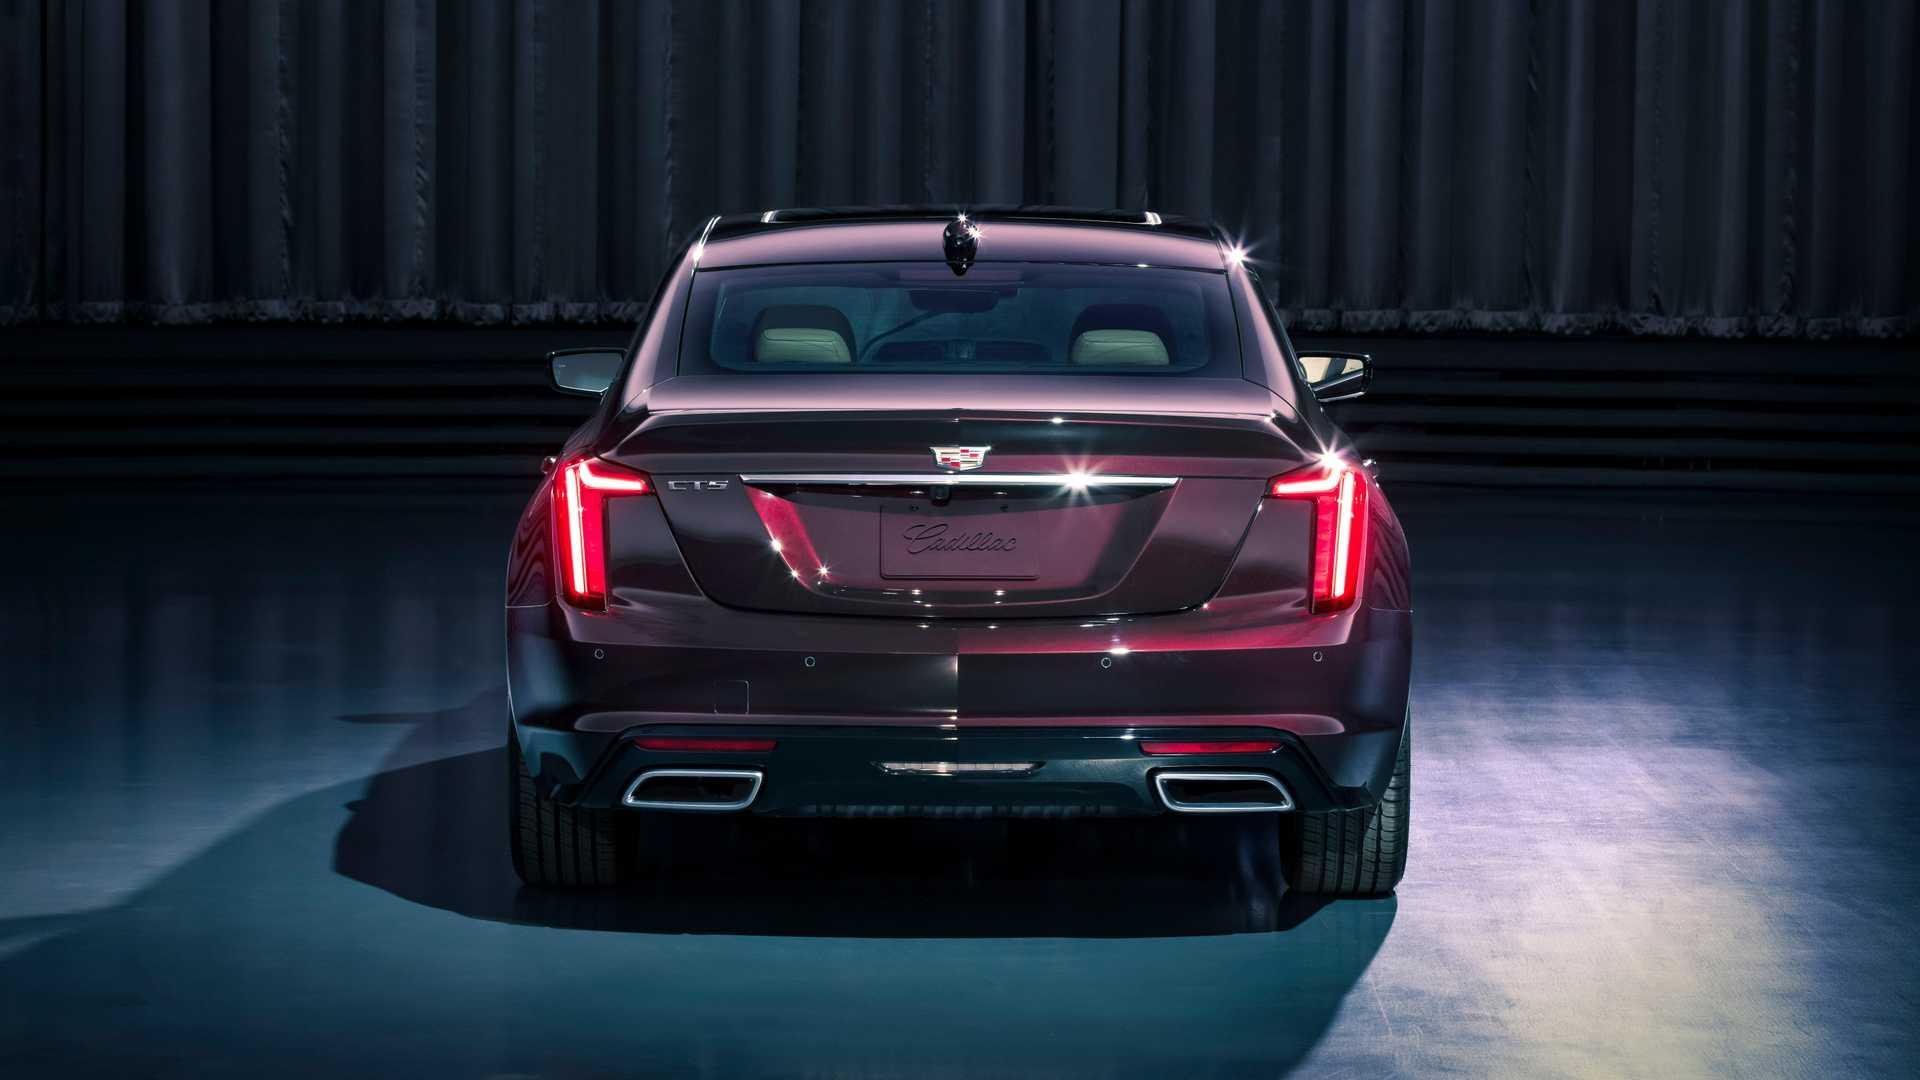 2020 Cadillac CT5 Premium Luxury Rear Wallpaper (10)